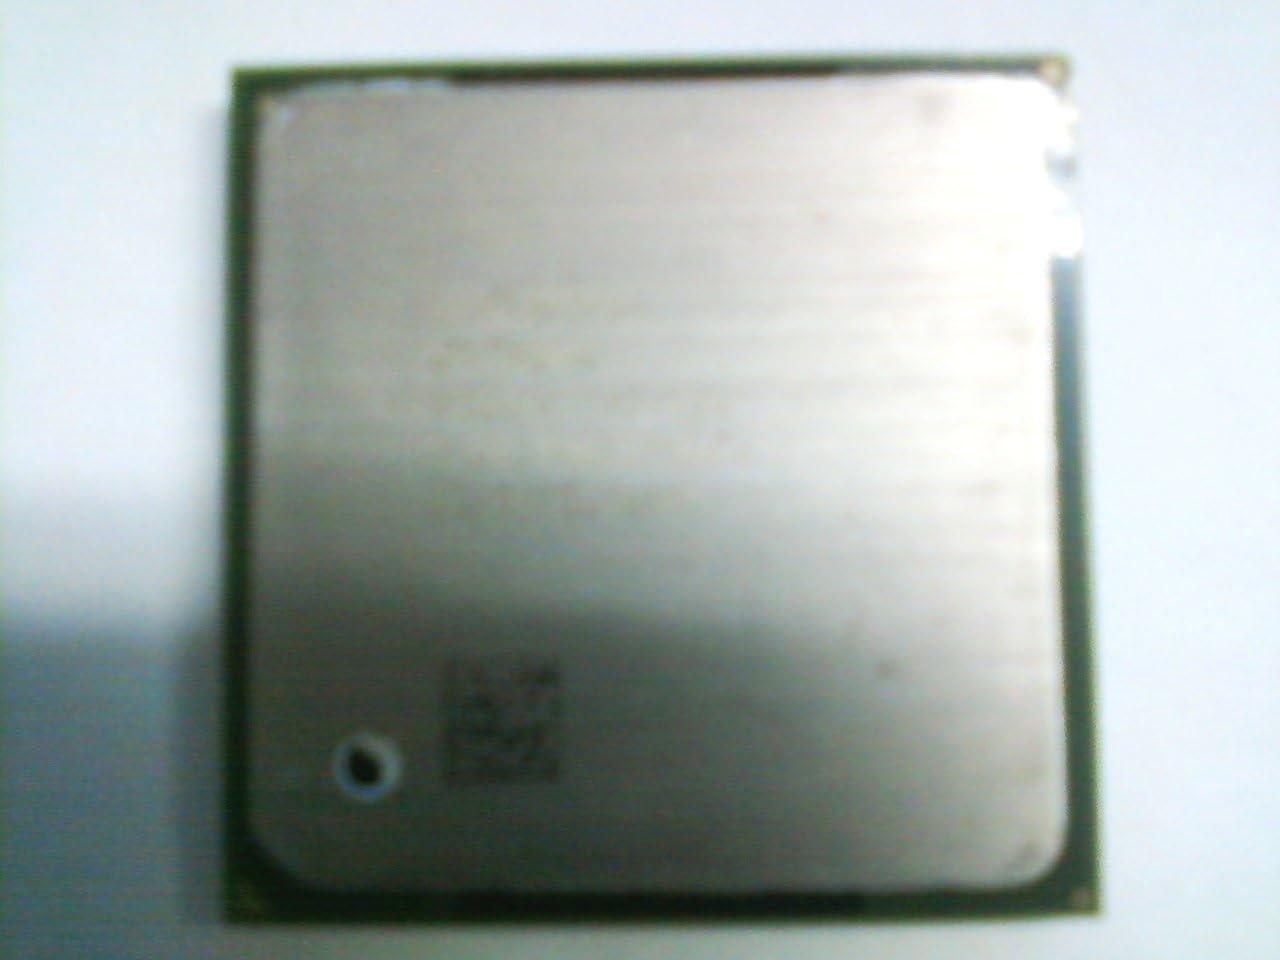 Intel Celeron 2.4 GHz 2.40GHZ//128//400 SL6VU Socket 478